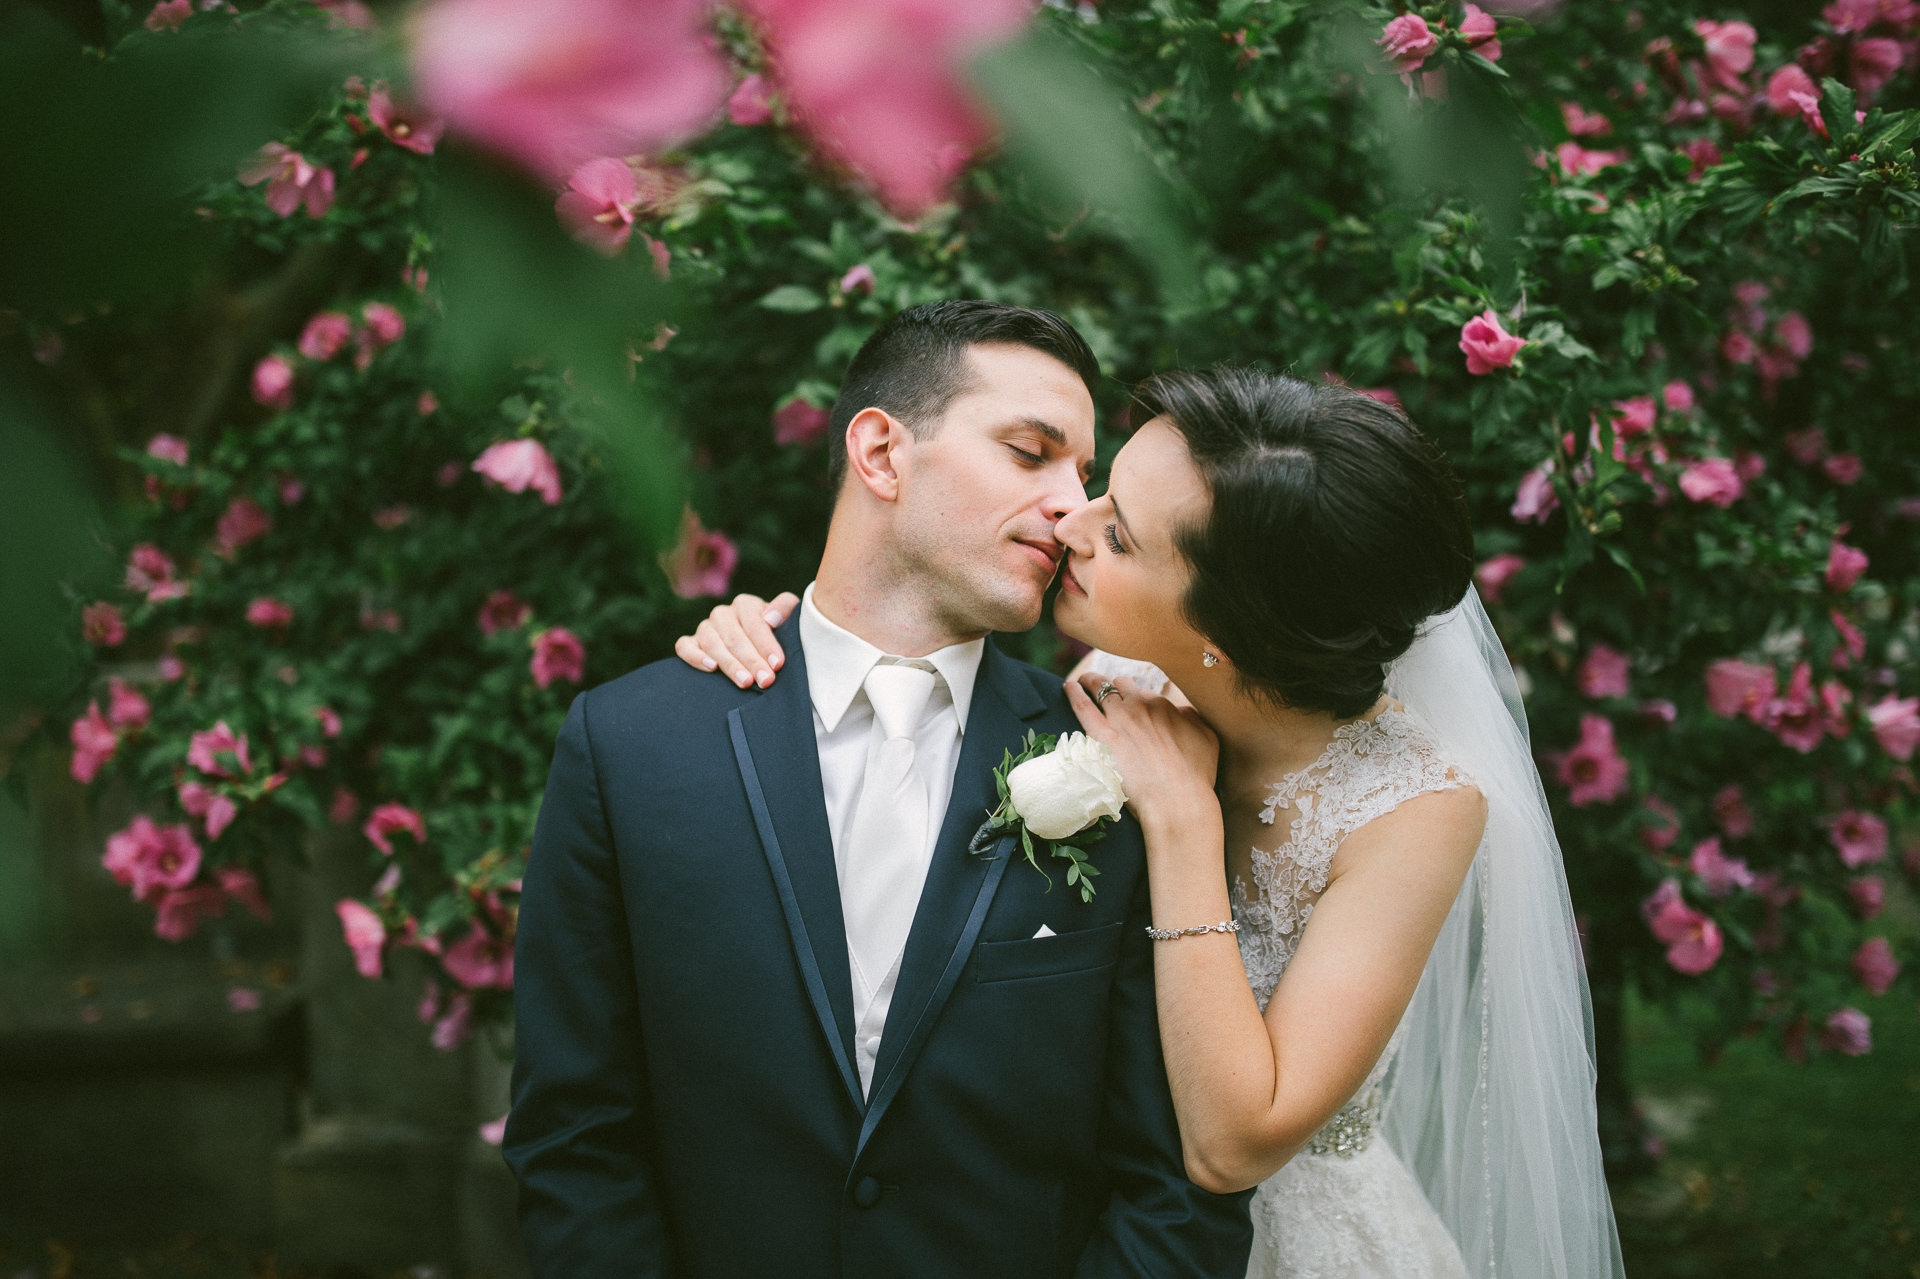 Intercontinental Hotel Wedding in Cleveland 2 7.jpg